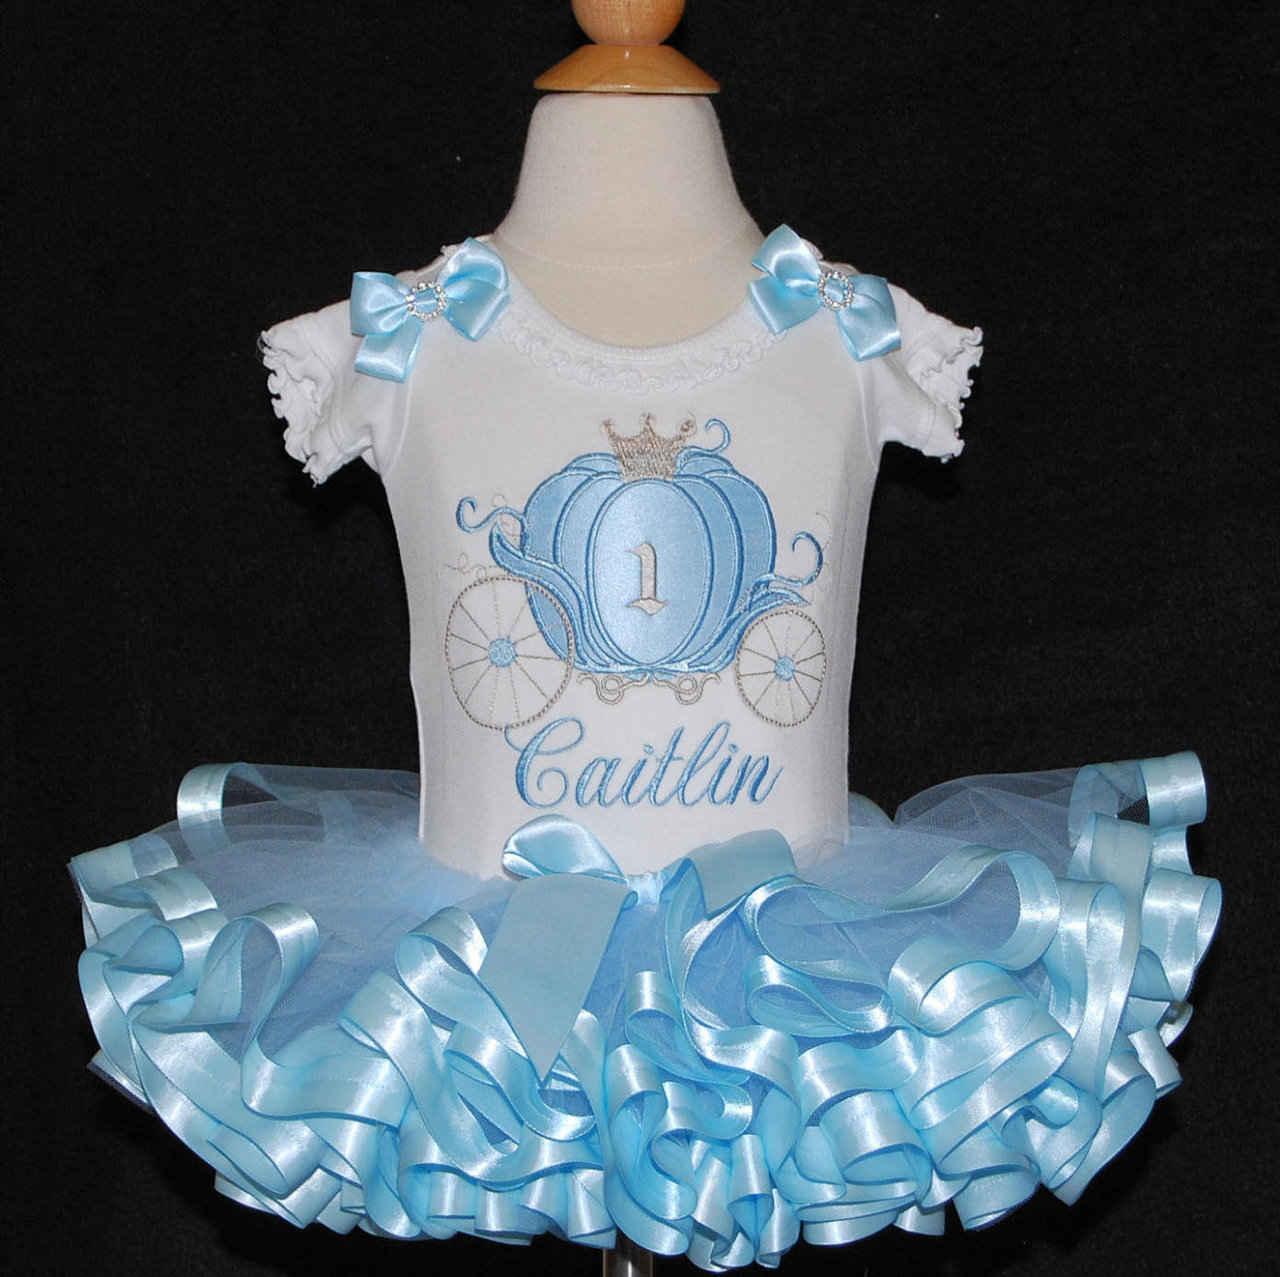 Princess 1st Birthday Outfit- Blue and Silver Cinderella princess-birthday-tutu-set-custom-birthday-outfits-girl-birthday-outfit-ideas